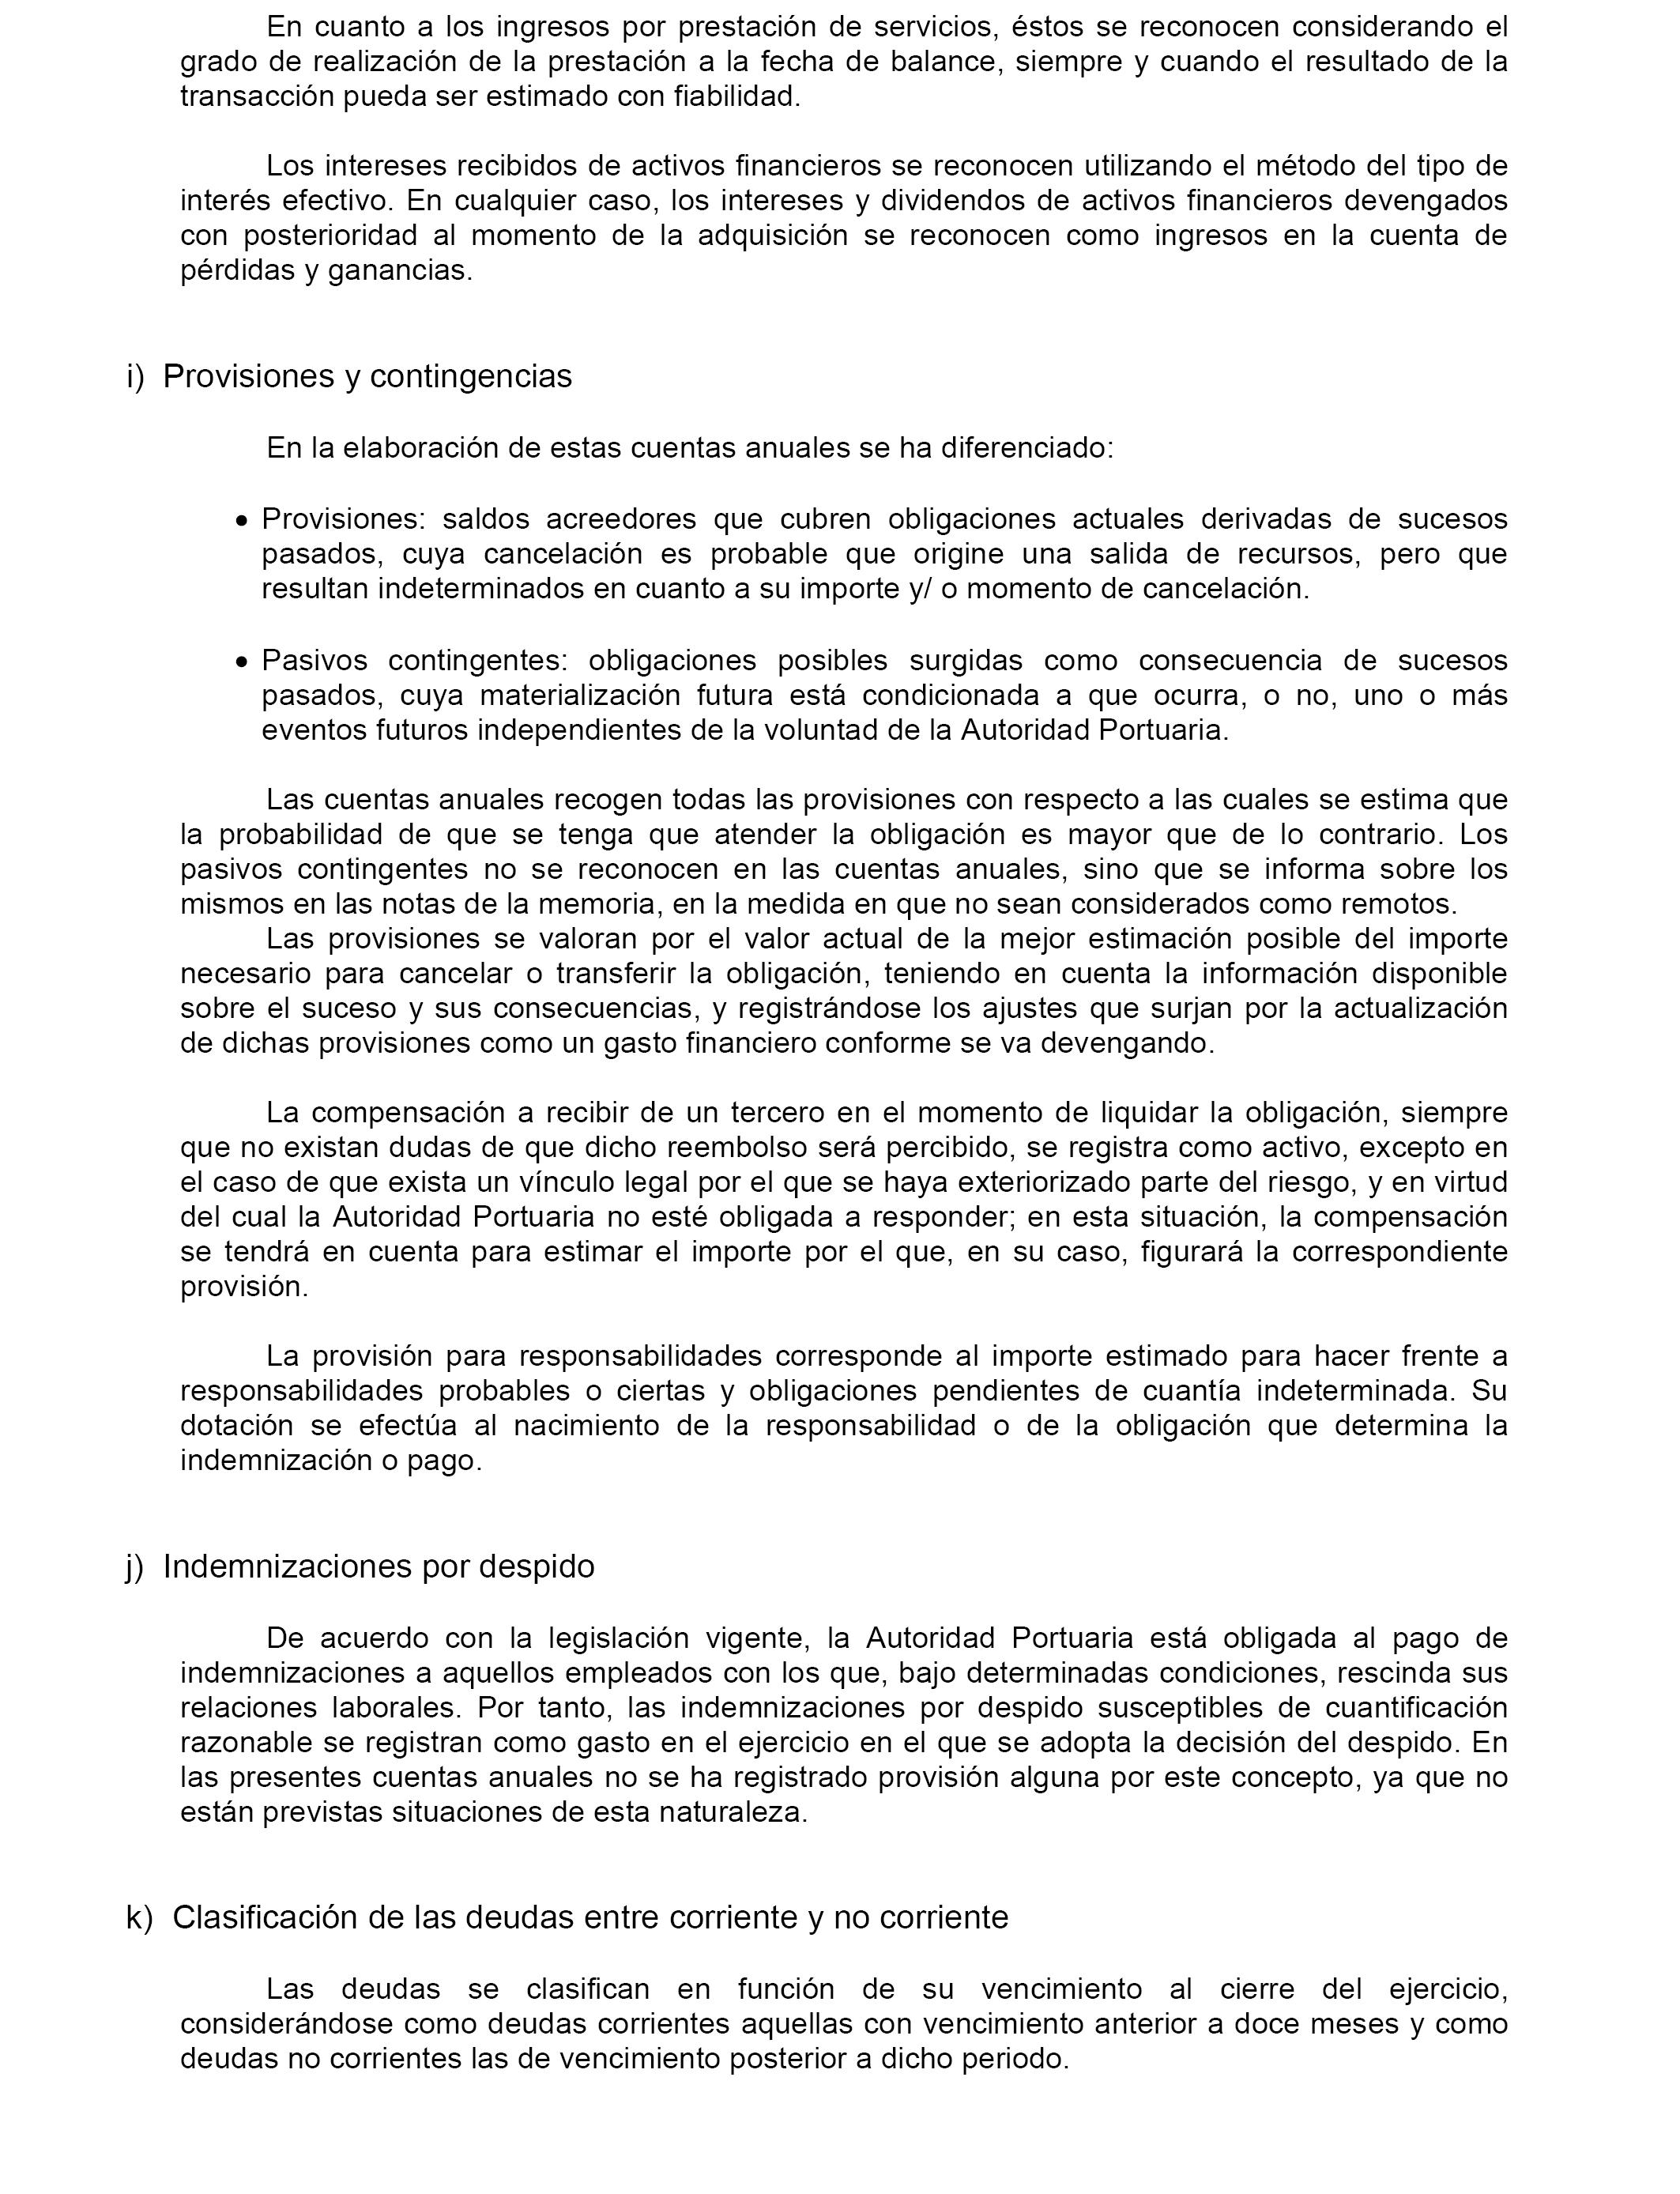 BOE.es - Documento BOE-A-2016-8121